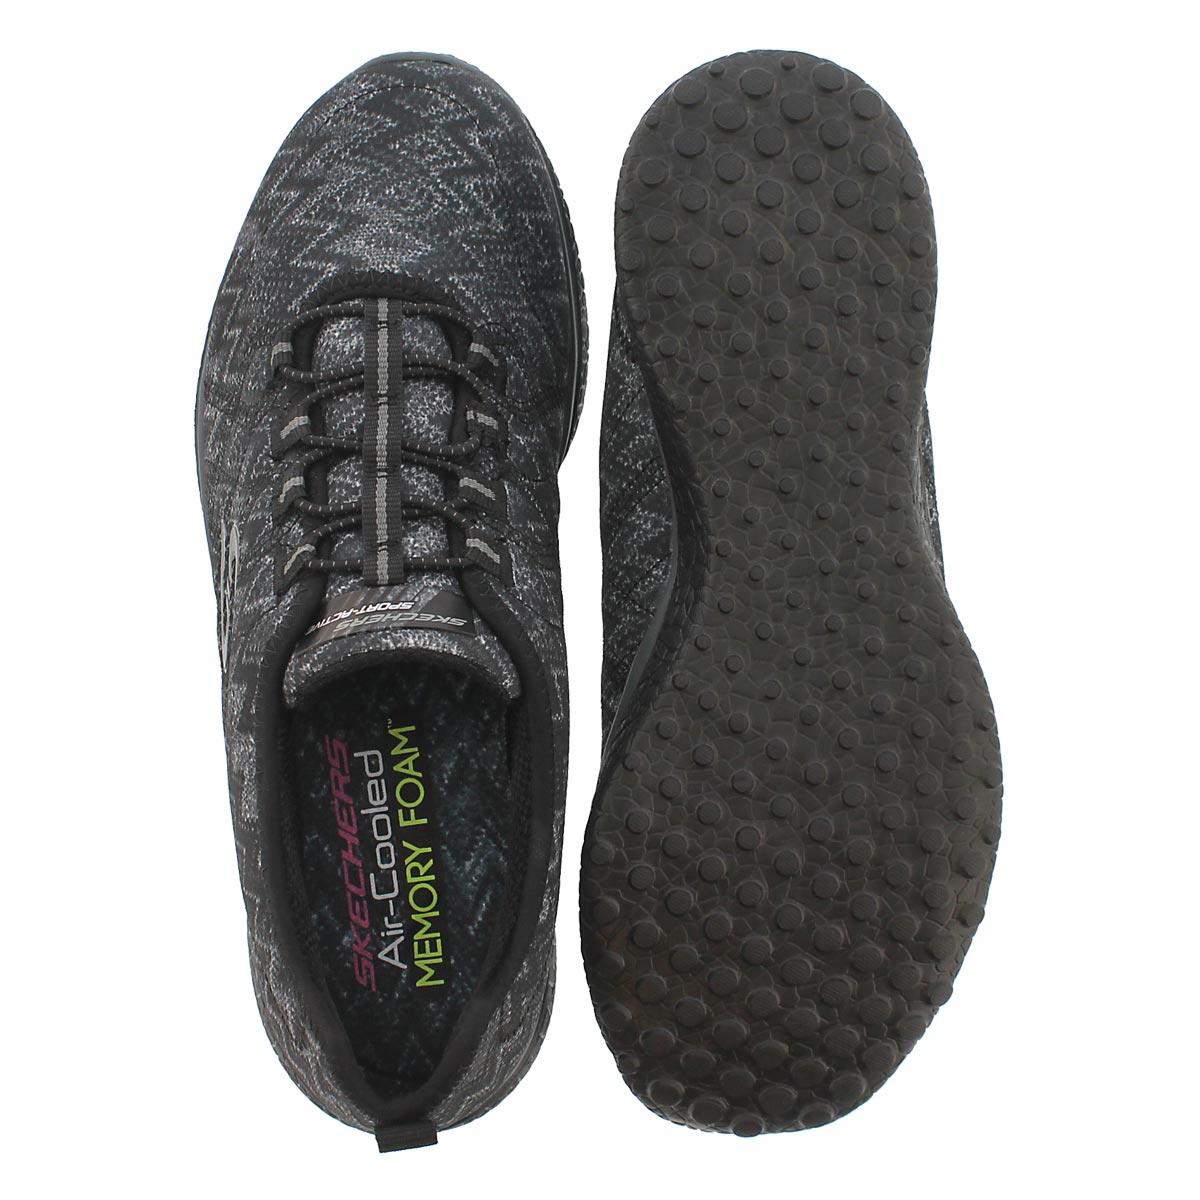 Lds Microburst blk/gry slip on sneaker